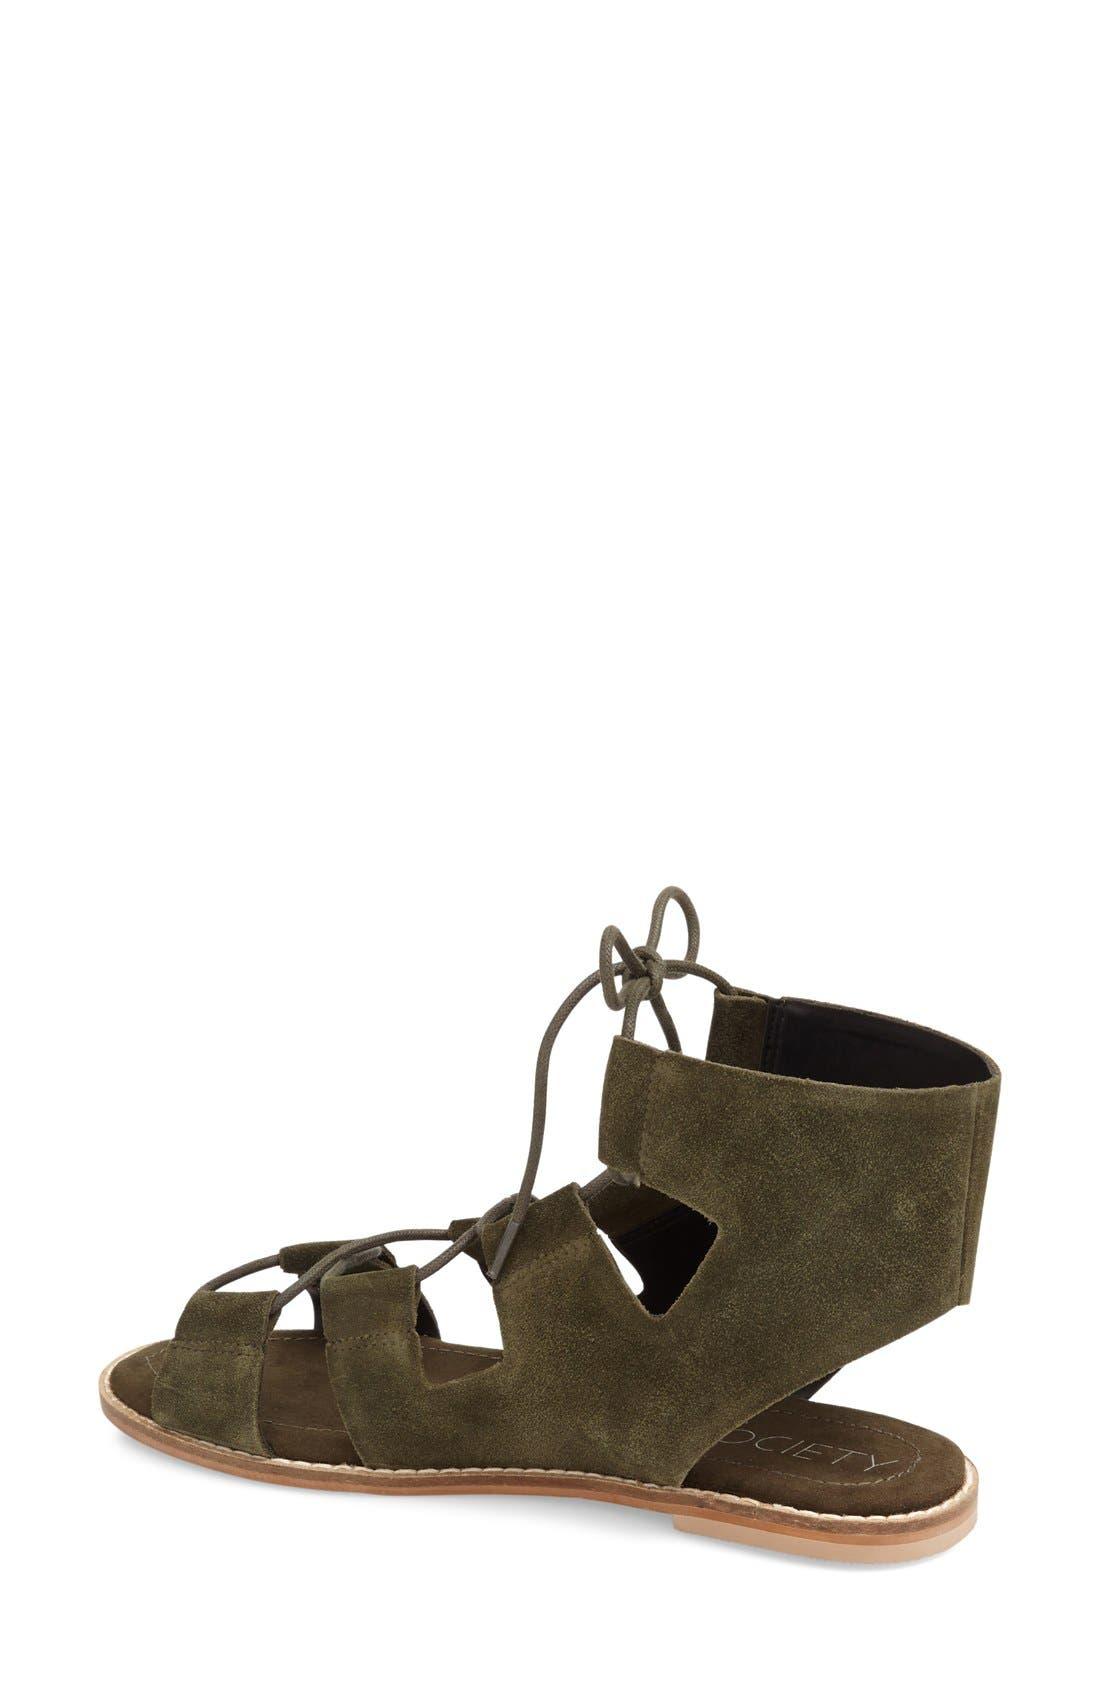 'Cady' Lace-Up Flat Sandal,                             Alternate thumbnail 7, color,